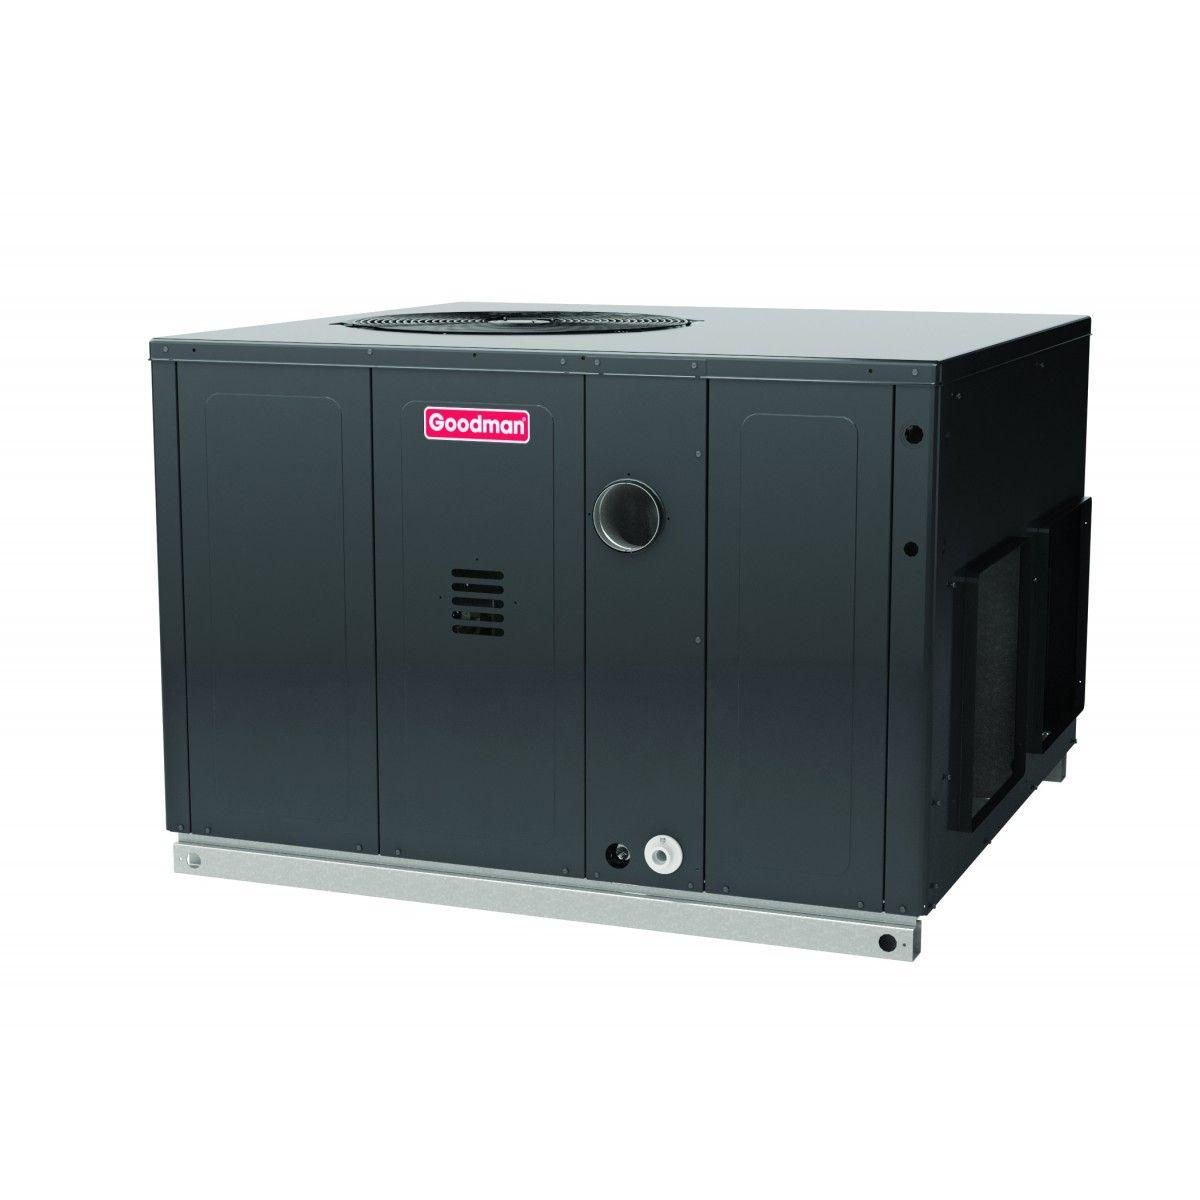 Goodman 3 0 Ton 14 SEER 80K BTU Packge Unit with Gas Heat - GPG1436080M41A